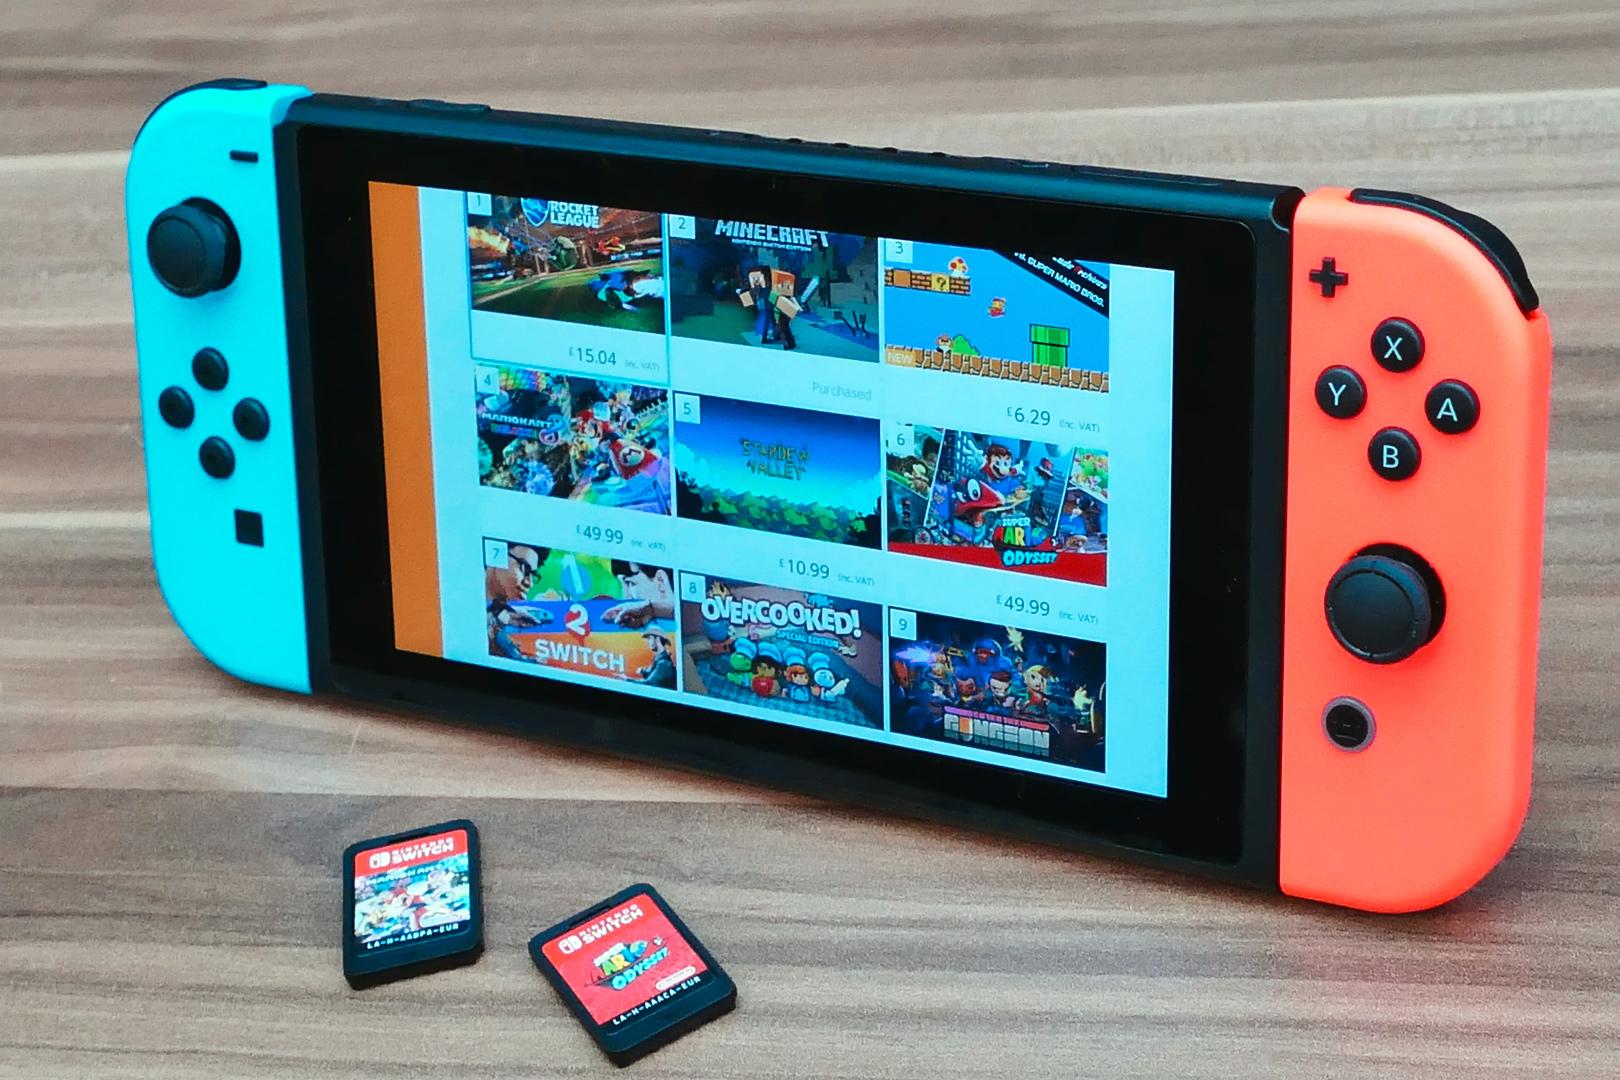 Trucos para aprovechar mejor Nintendo Switch